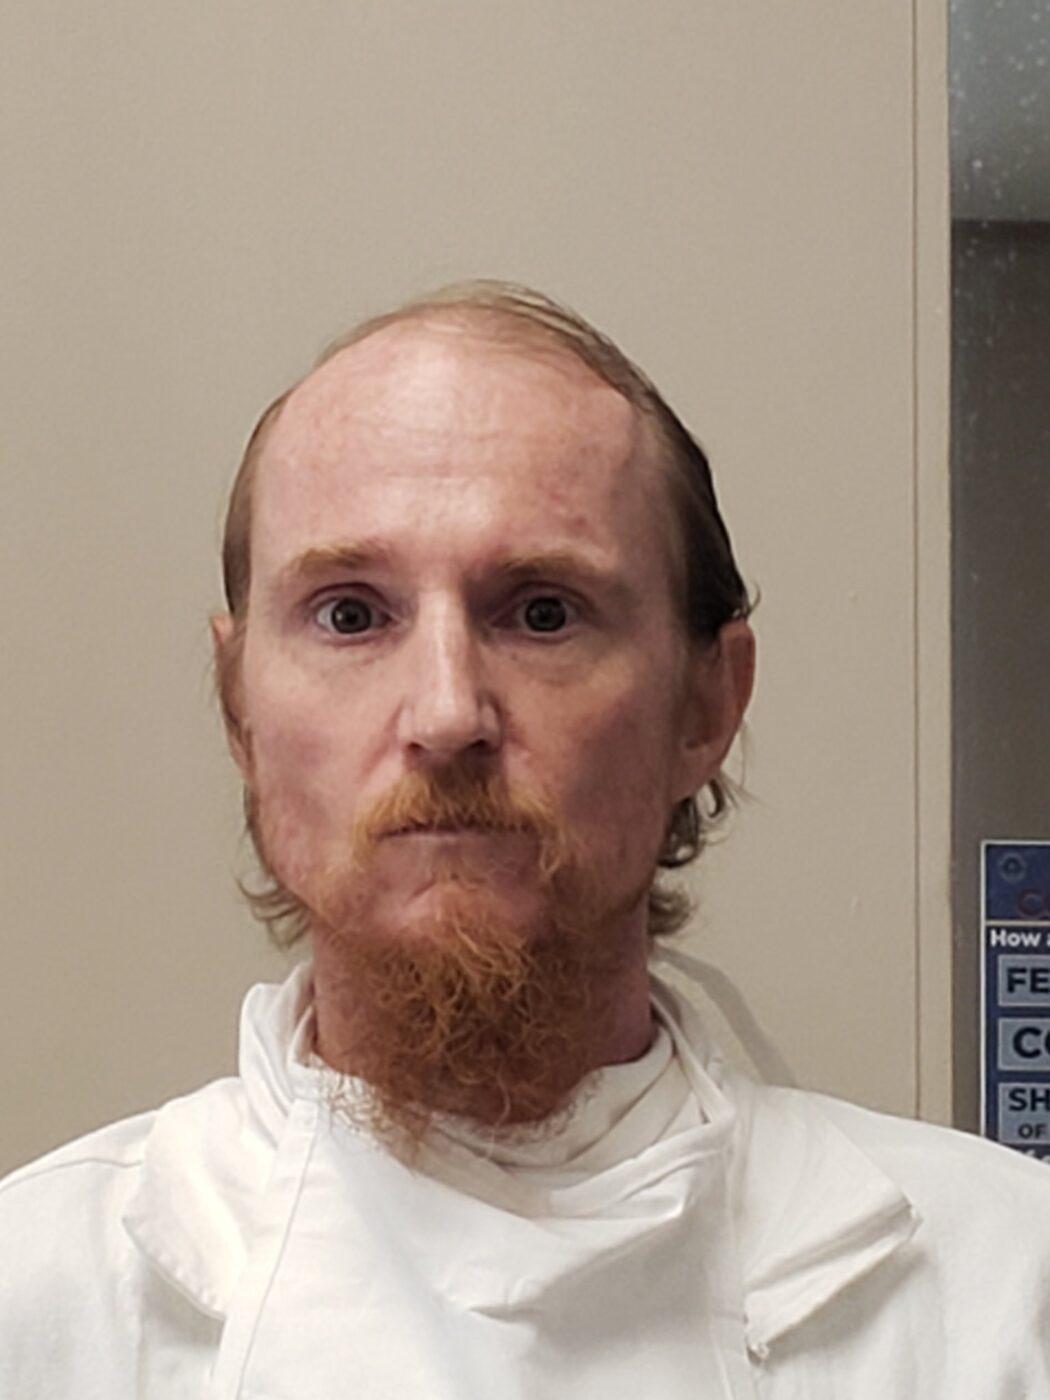 California DOJ Criminalists Help Solve 1995 Murder in Redding